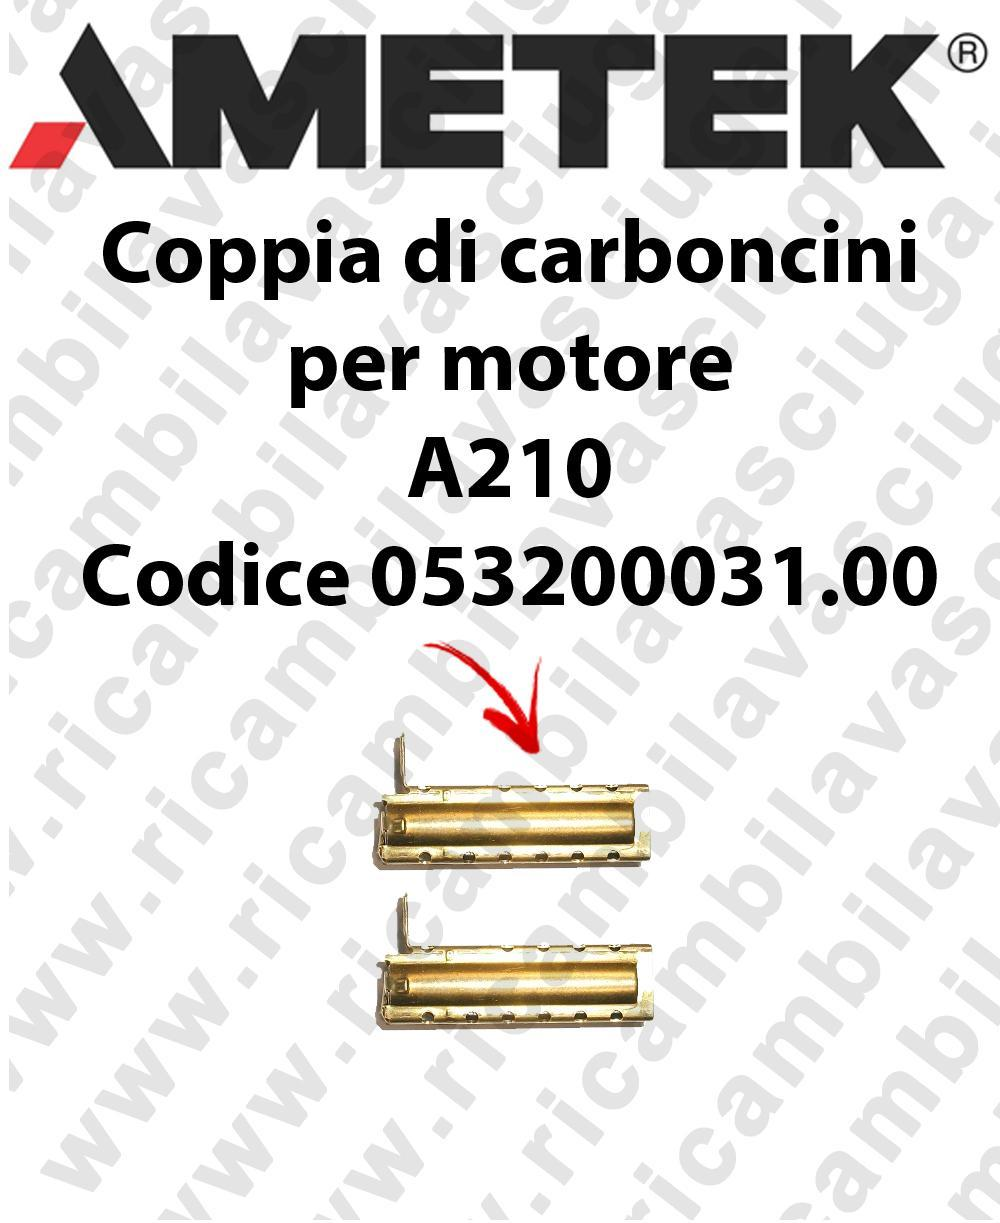 Coupled carbon brush motor for vacuum motor  Ametek A210 Cod: 053200031.00